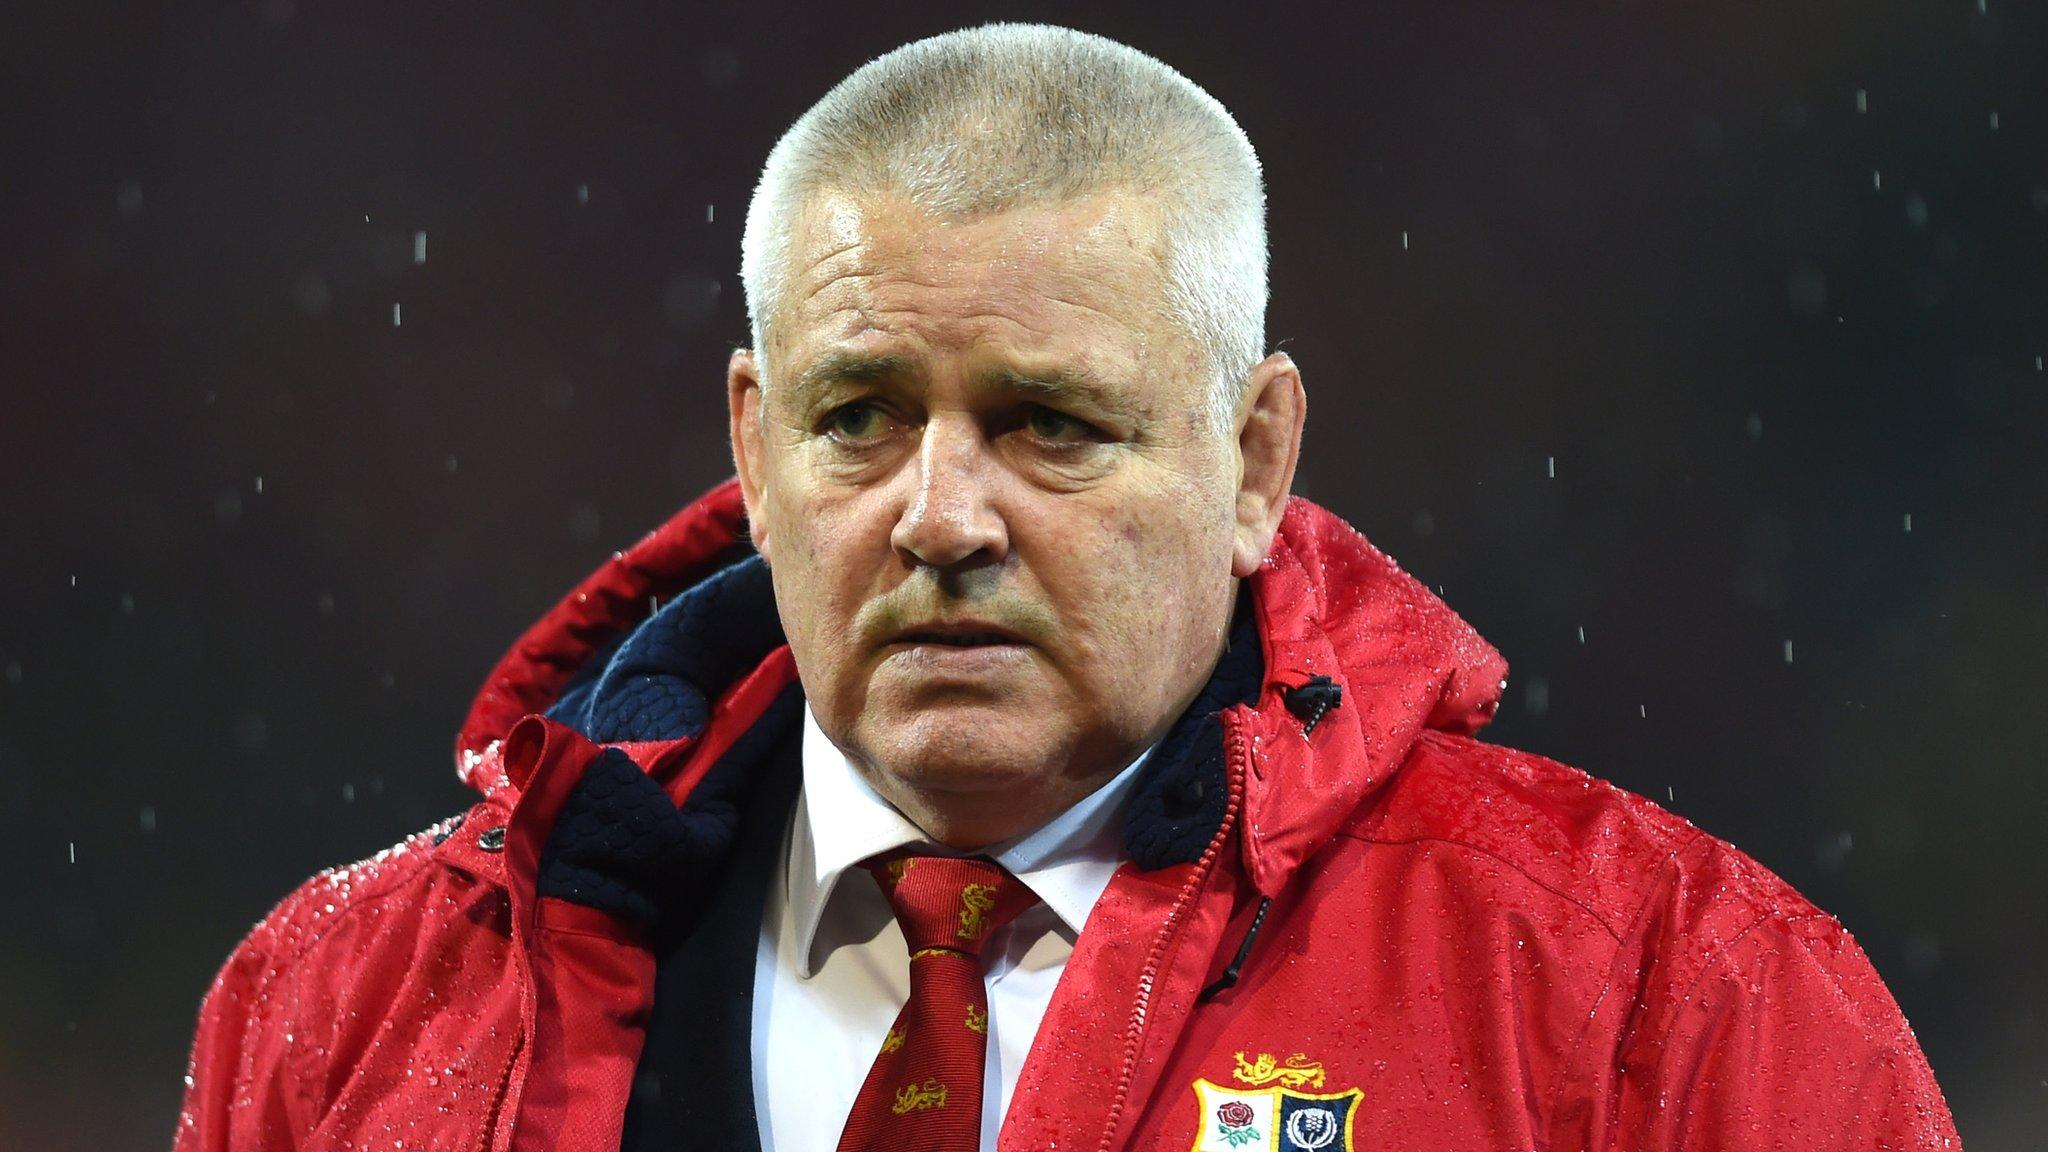 Warren Gatland: Wales coach ideal candidate for 2021 tour, says Matthew Rees